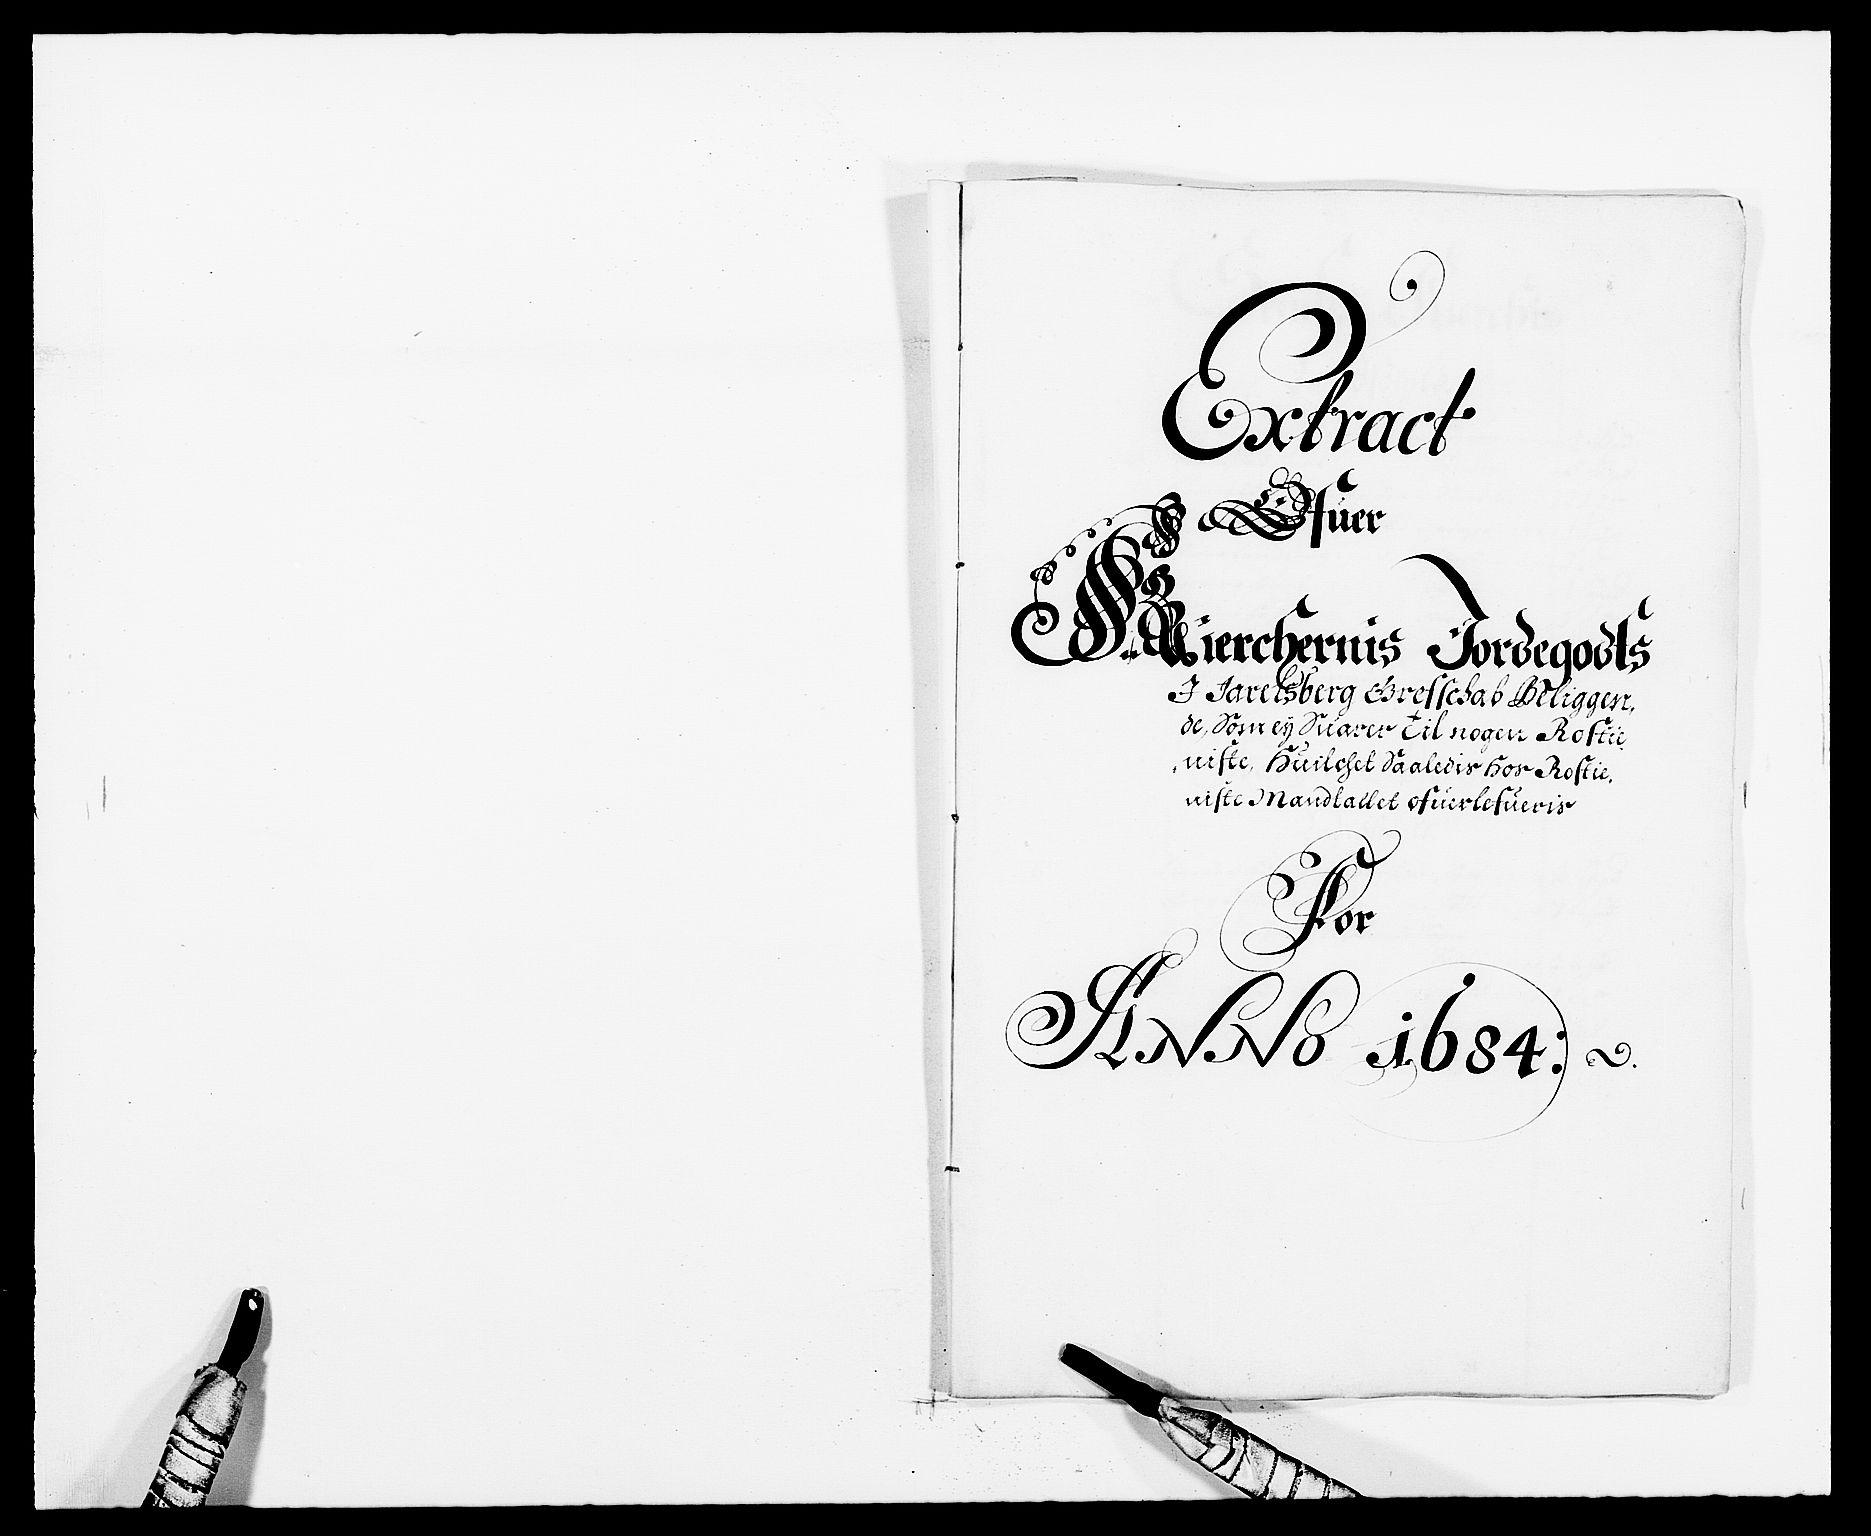 RA, Rentekammeret inntil 1814, Reviderte regnskaper, Fogderegnskap, R32/L1855: Fogderegnskap Jarlsberg grevskap, 1684, s. 105